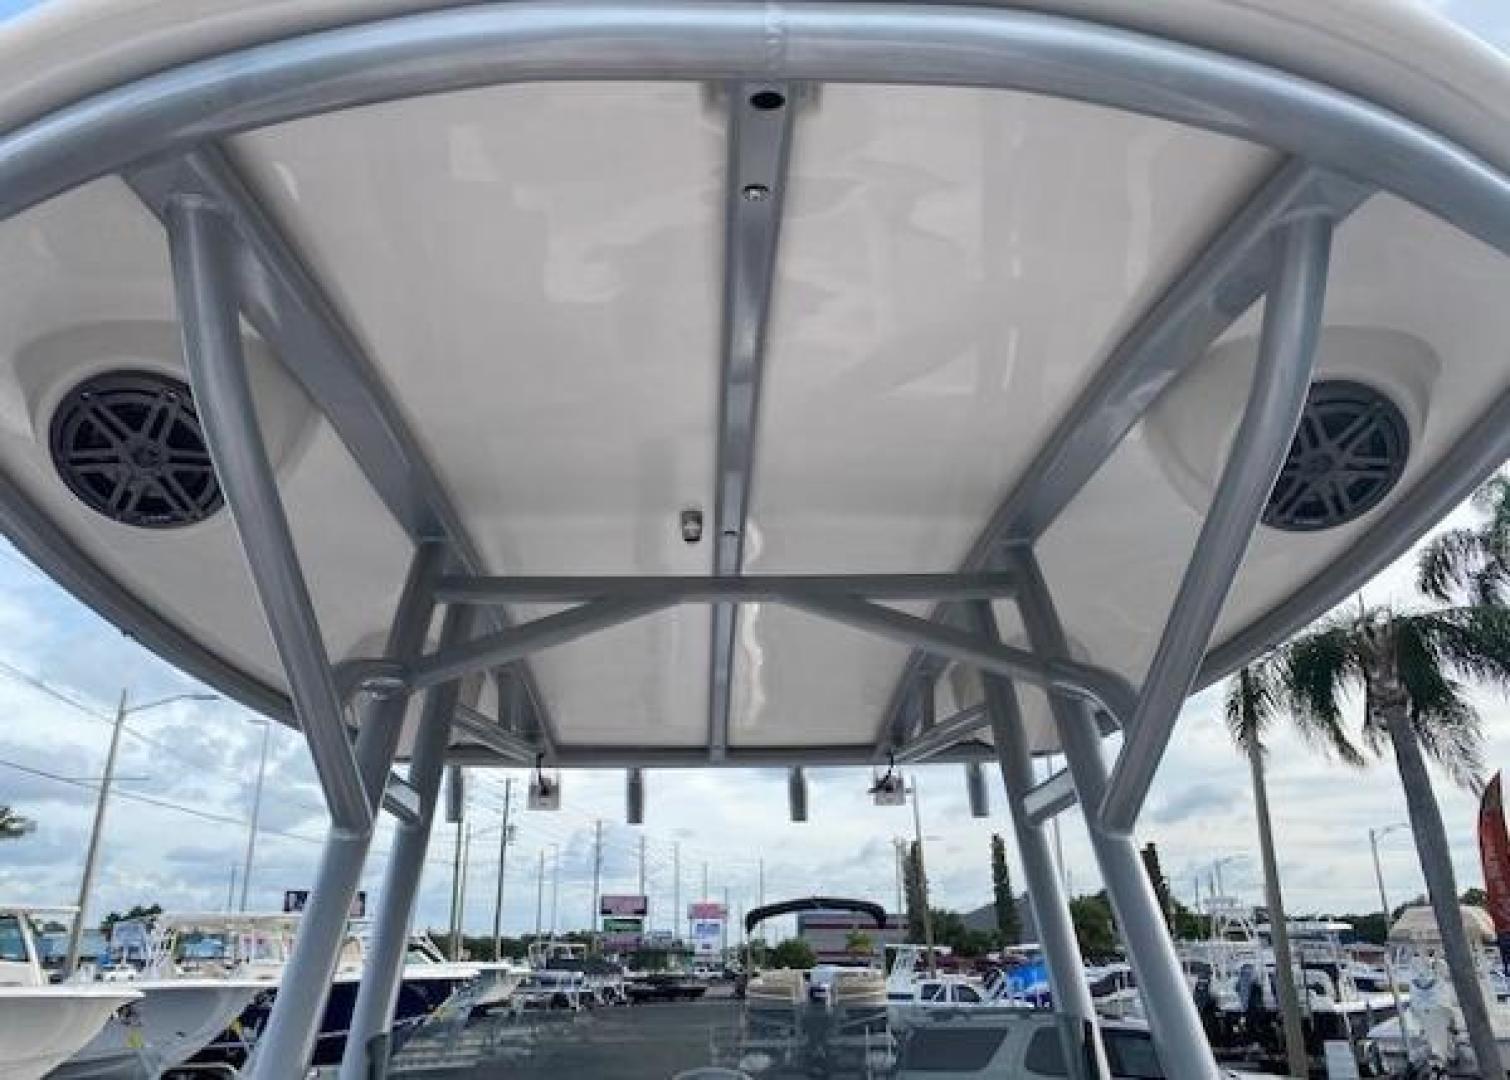 Starcraft-MDX 211 CC 2021-Starcraft MDX 211 CC Tampa Bay-Florida-United States-1533006 | Thumbnail